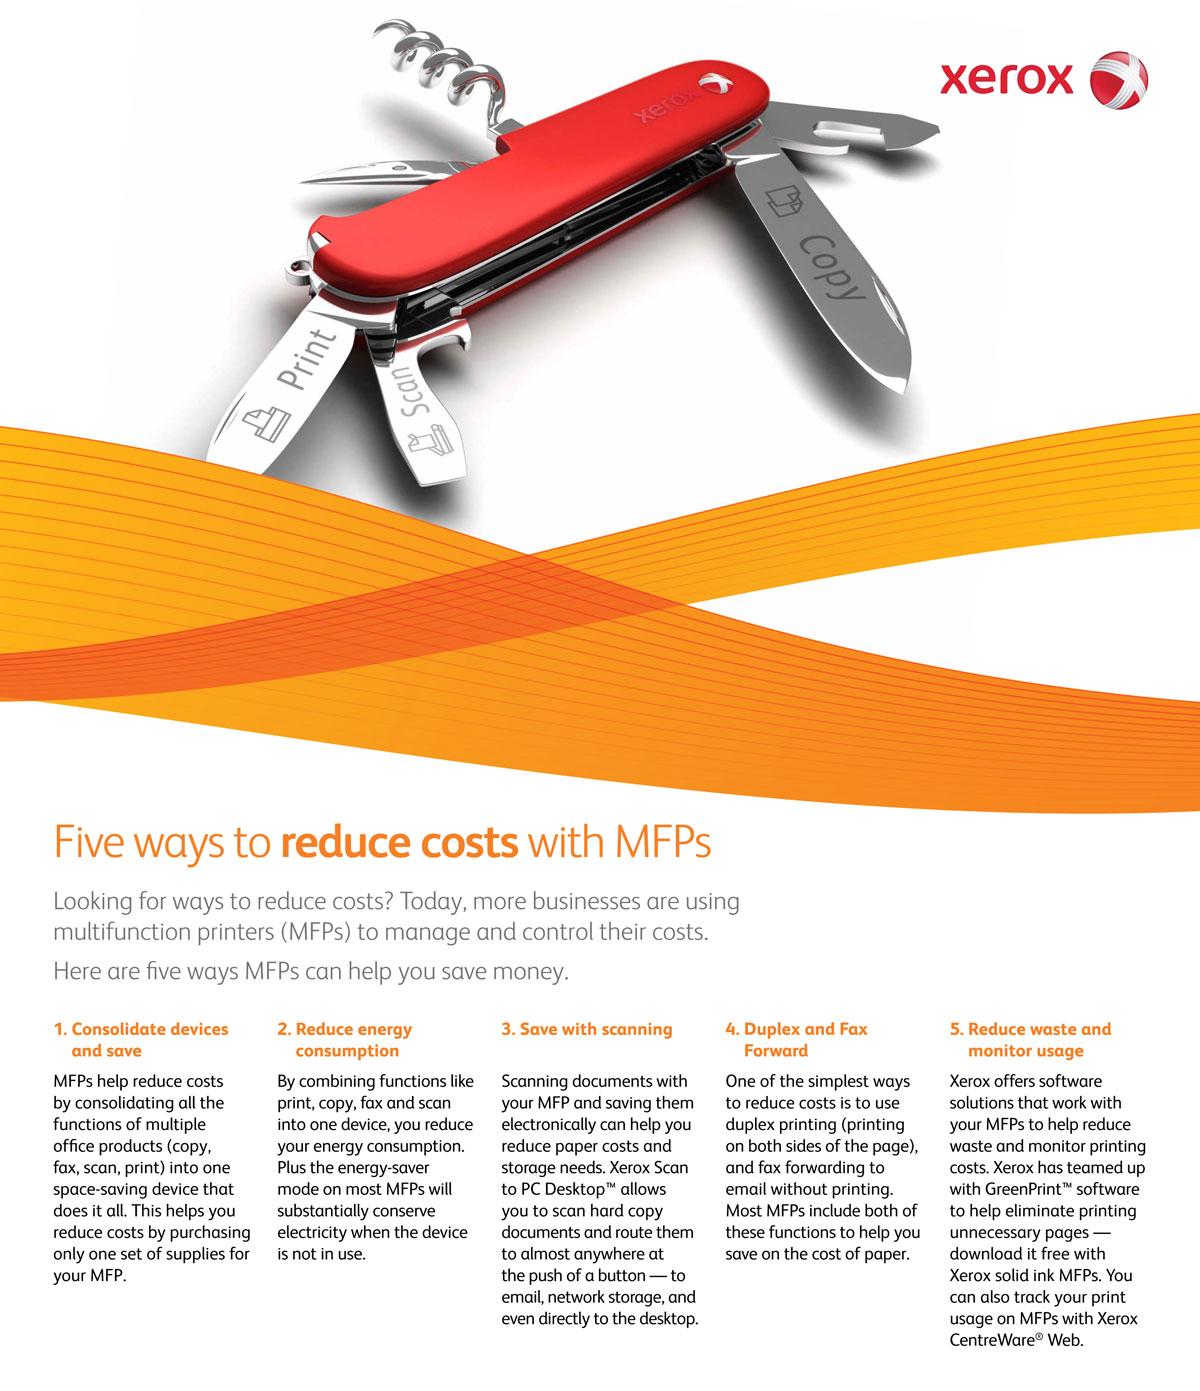 xerox reduce costs sbm